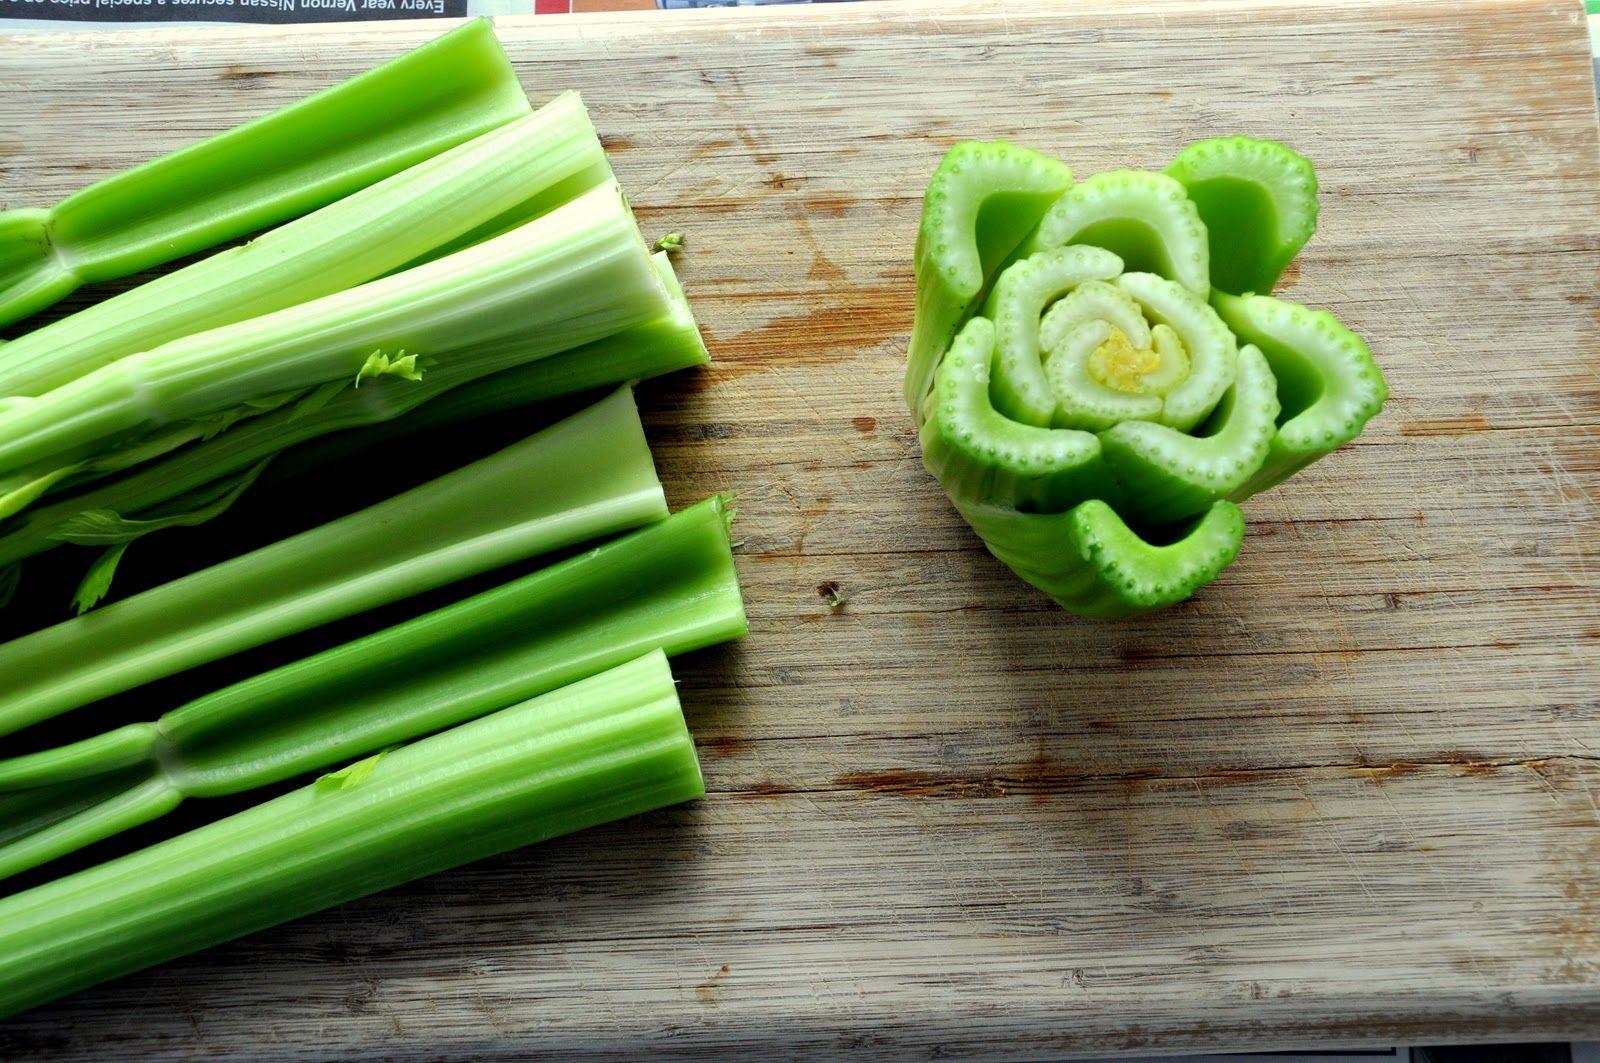 16 foods thatll regrow from kitchen scraps veggie